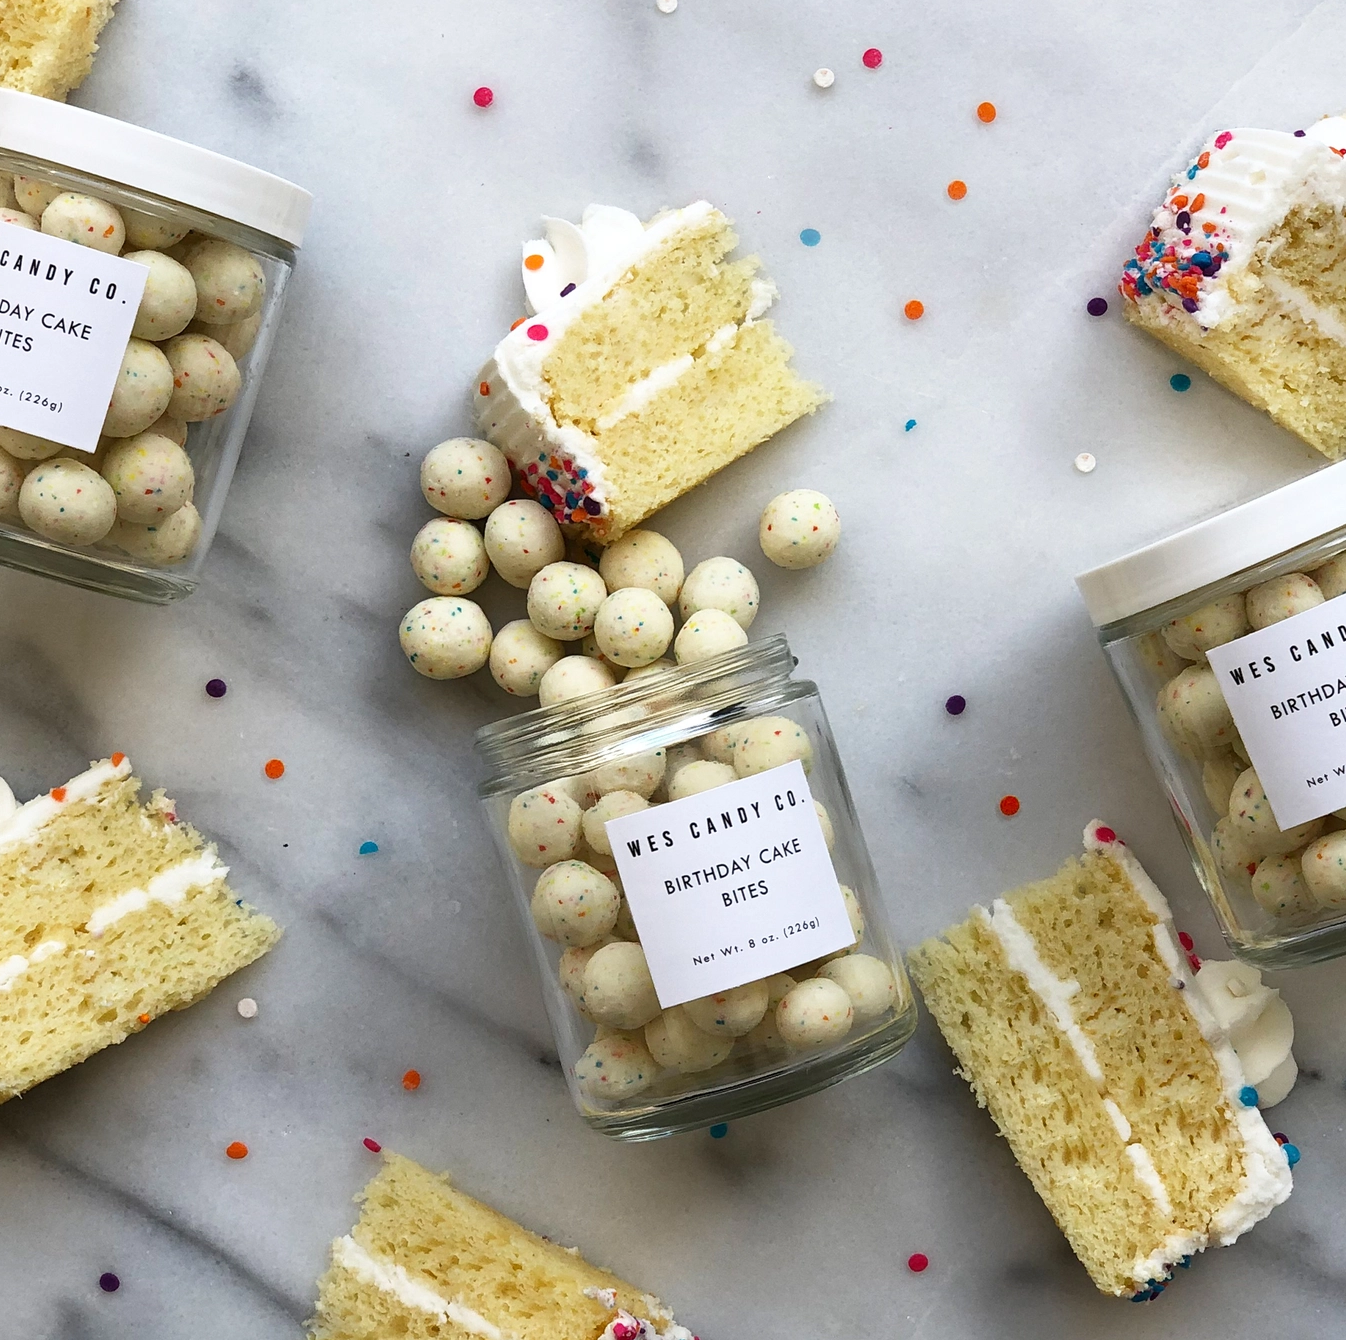 Wes Candy Co Birthday Cake Bites